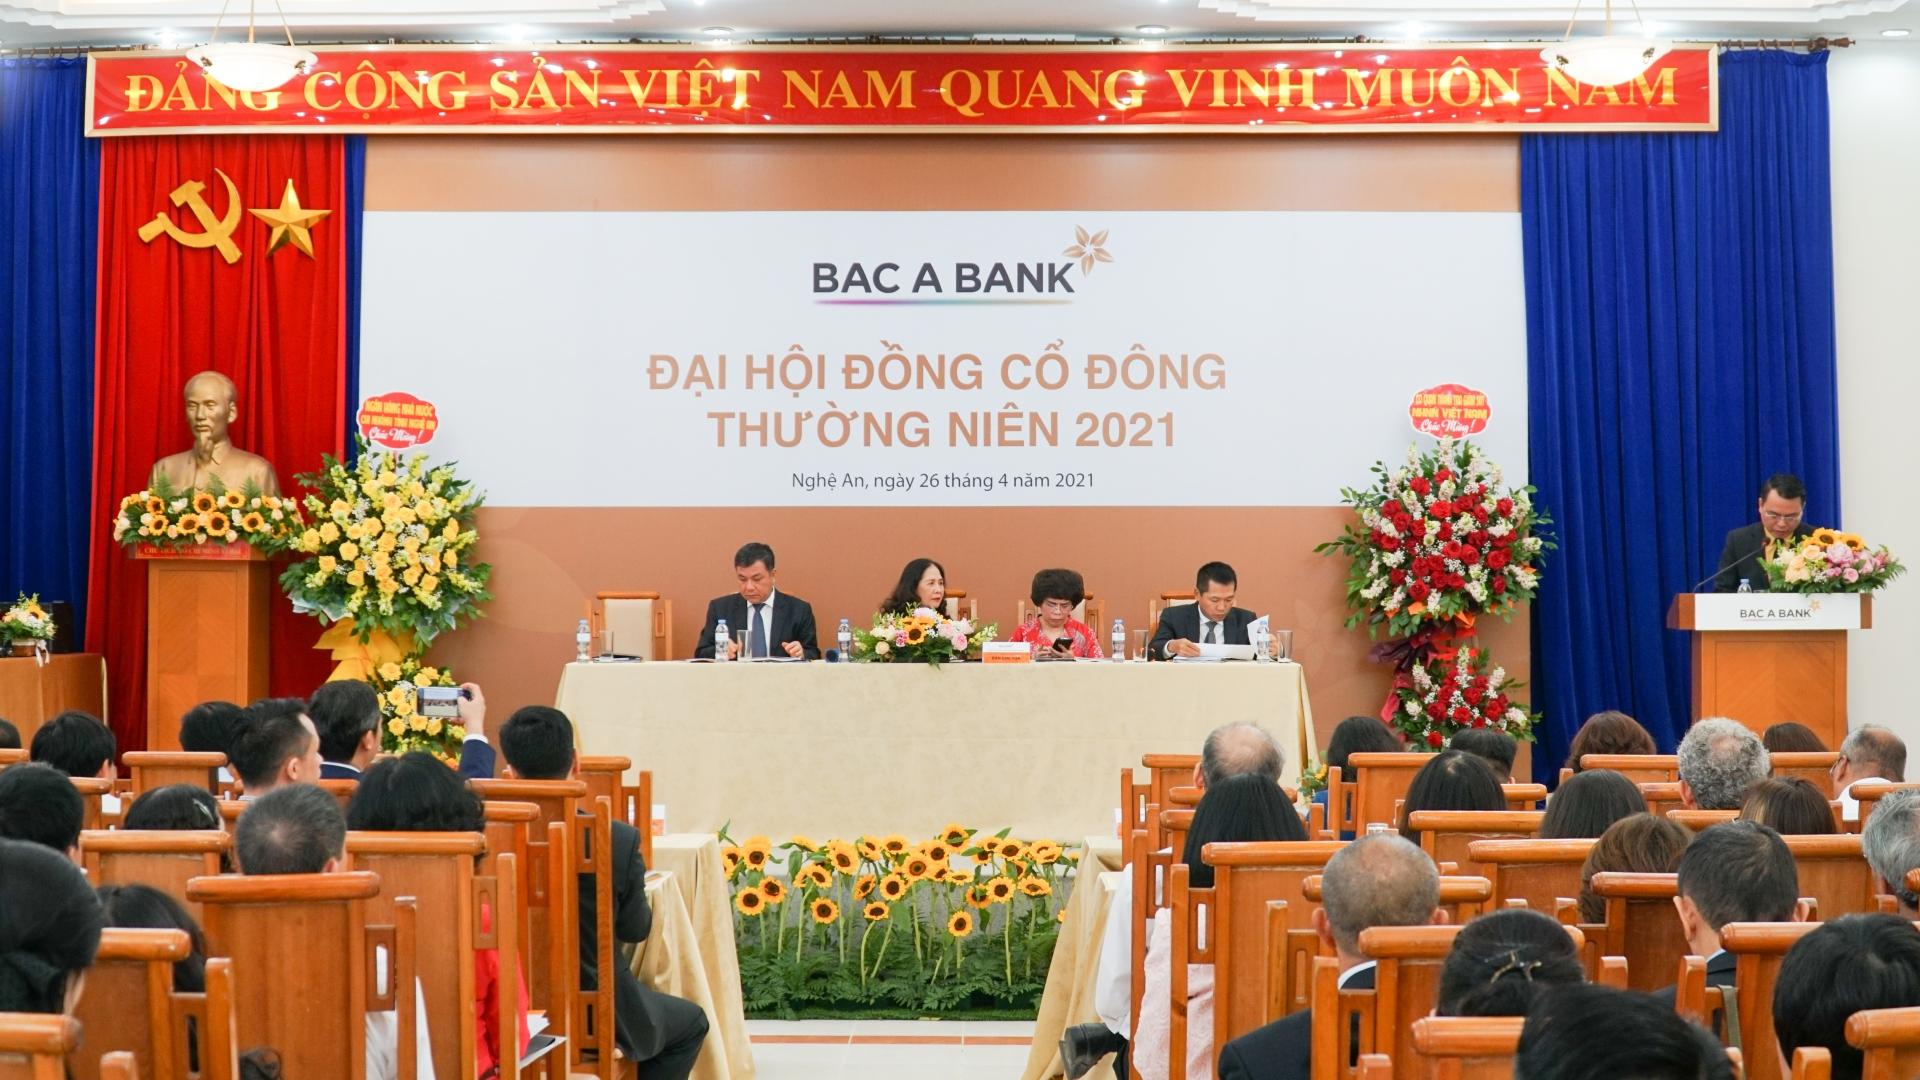 BAC A BANK sets new development targets